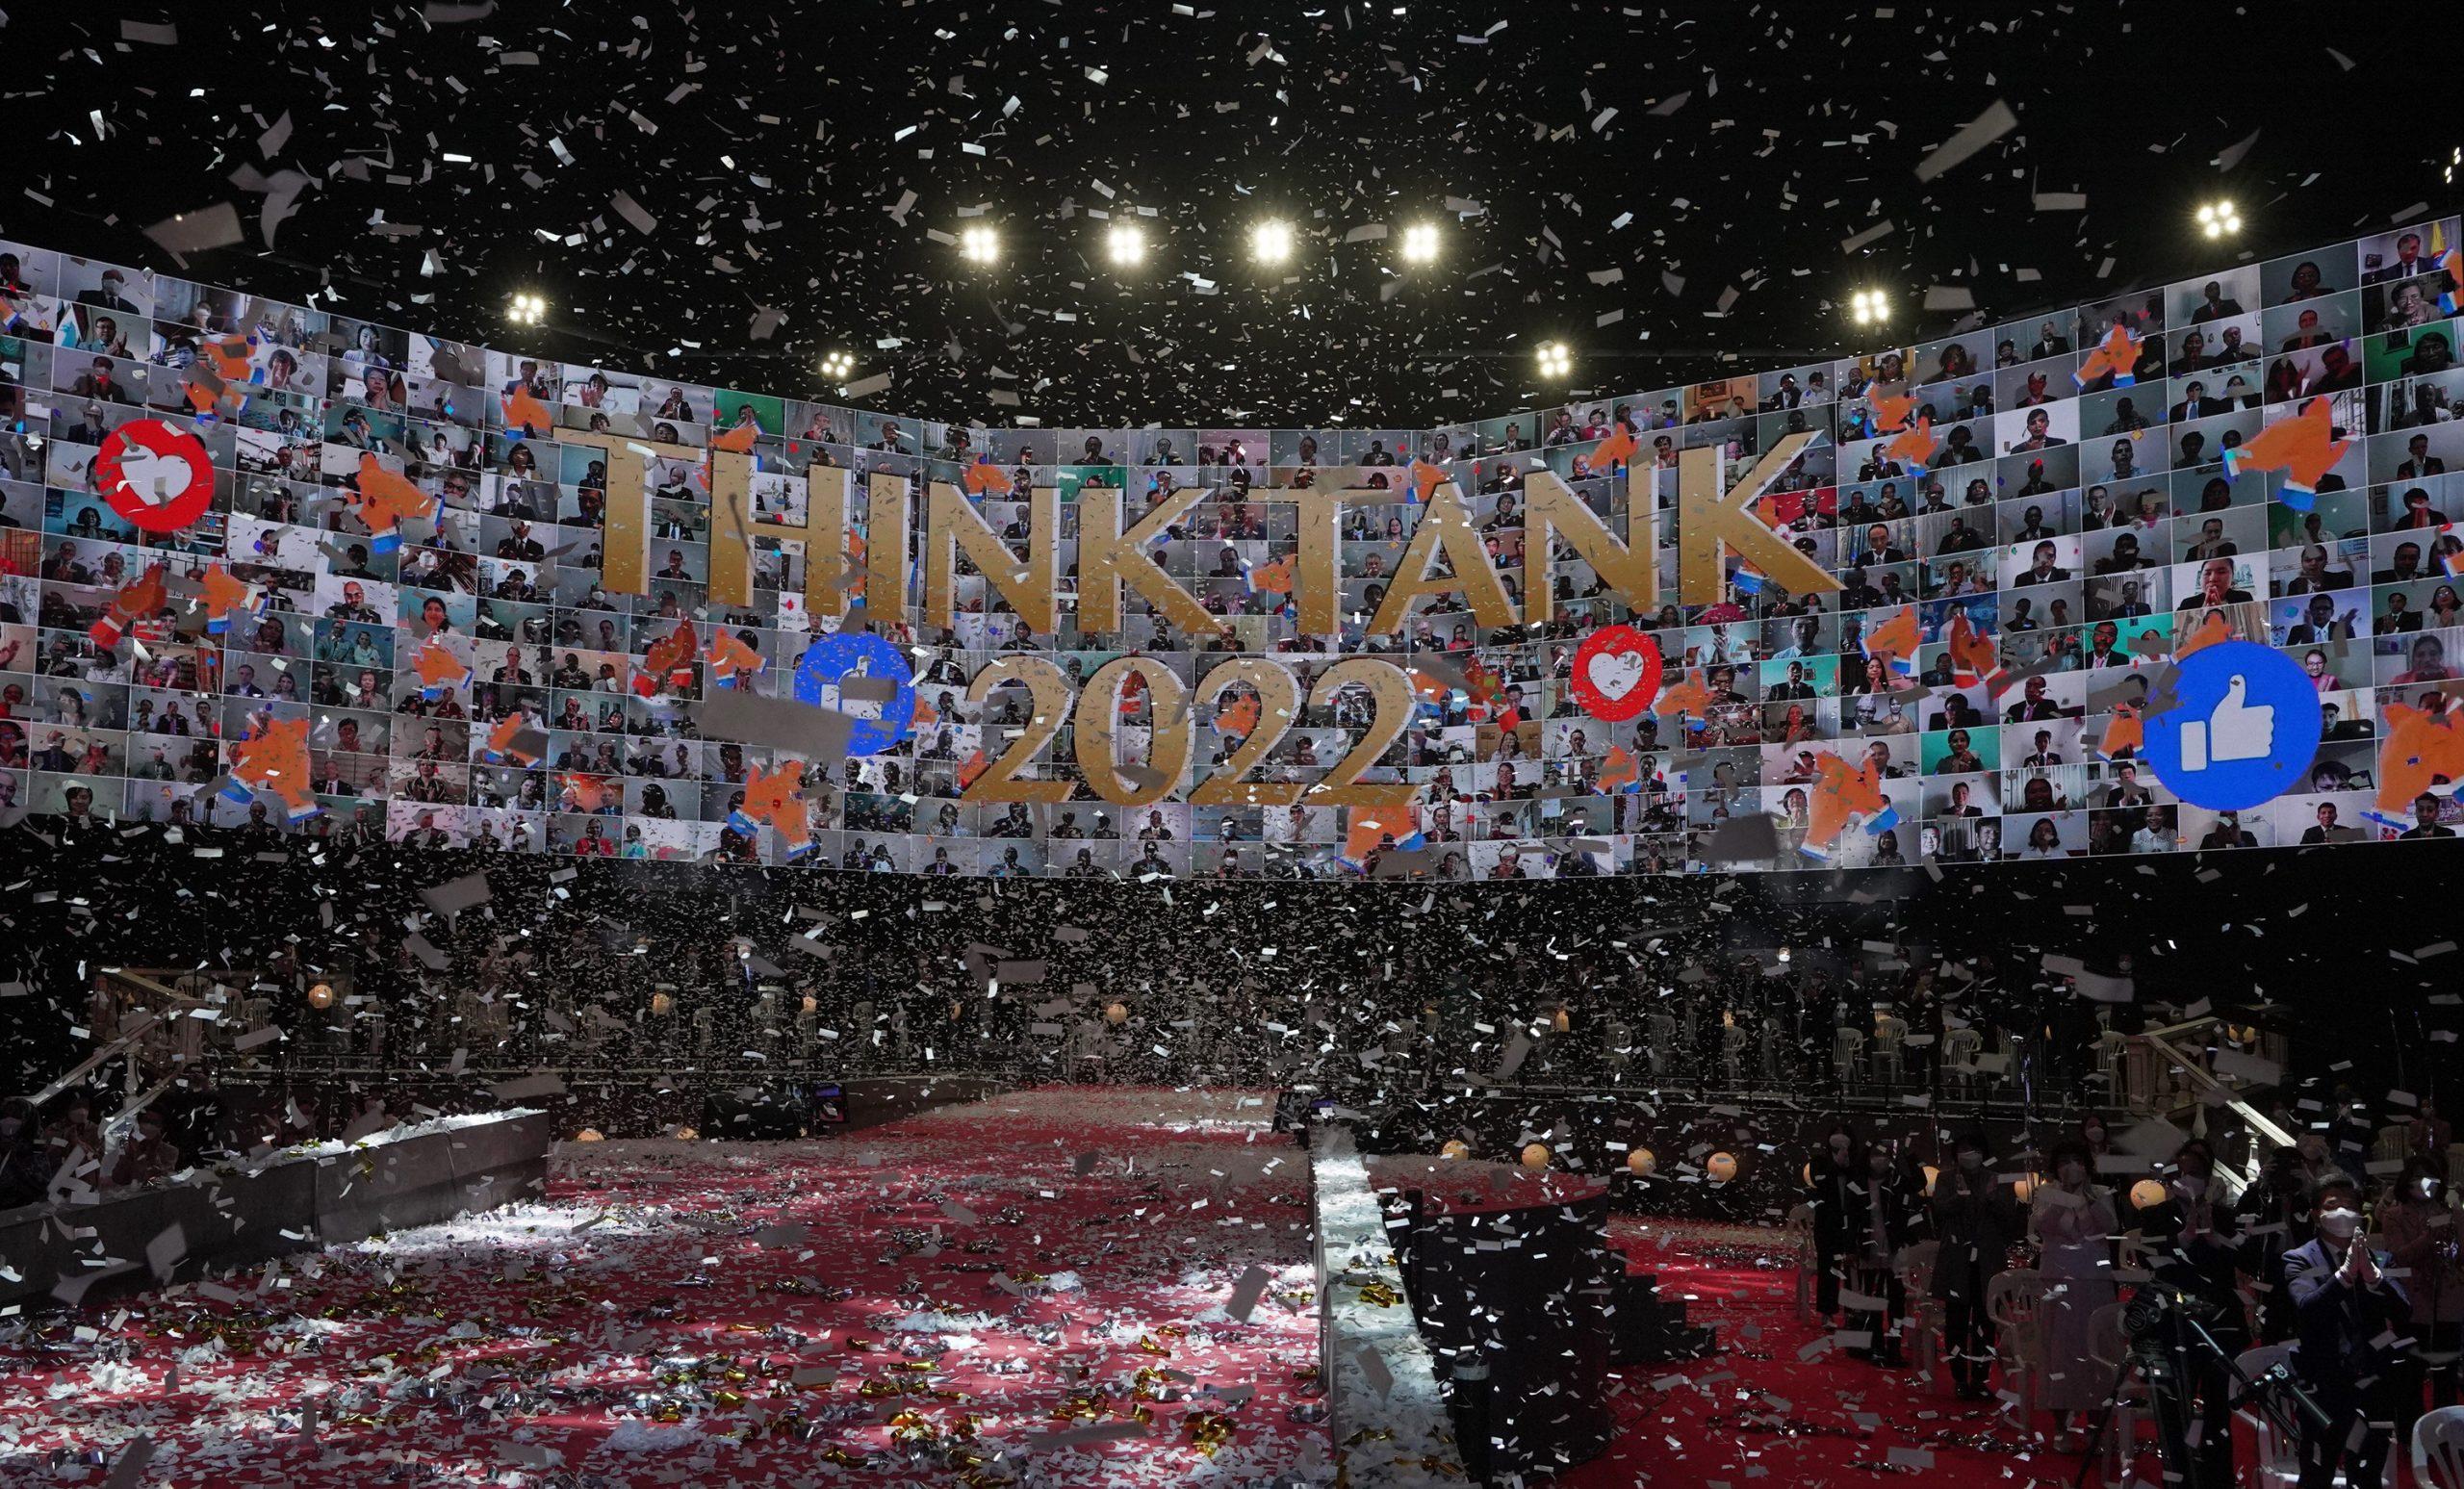 pOd ¦ ¦¦ o¦ Think Tank 2020 G¦n ± n °¦d n¦µ scaled